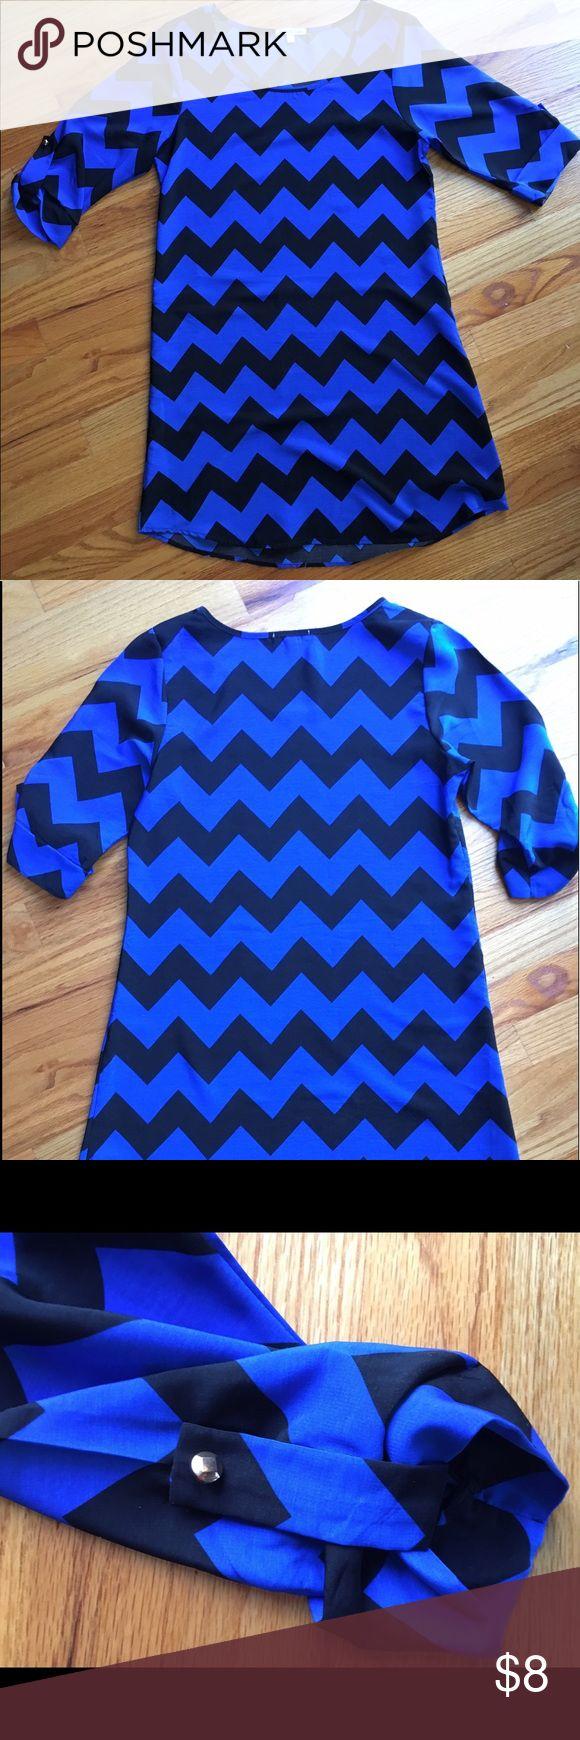 Chevron dress! Black and blue chevron dress size small! Charlotte Russe Dresses Long Sleeve